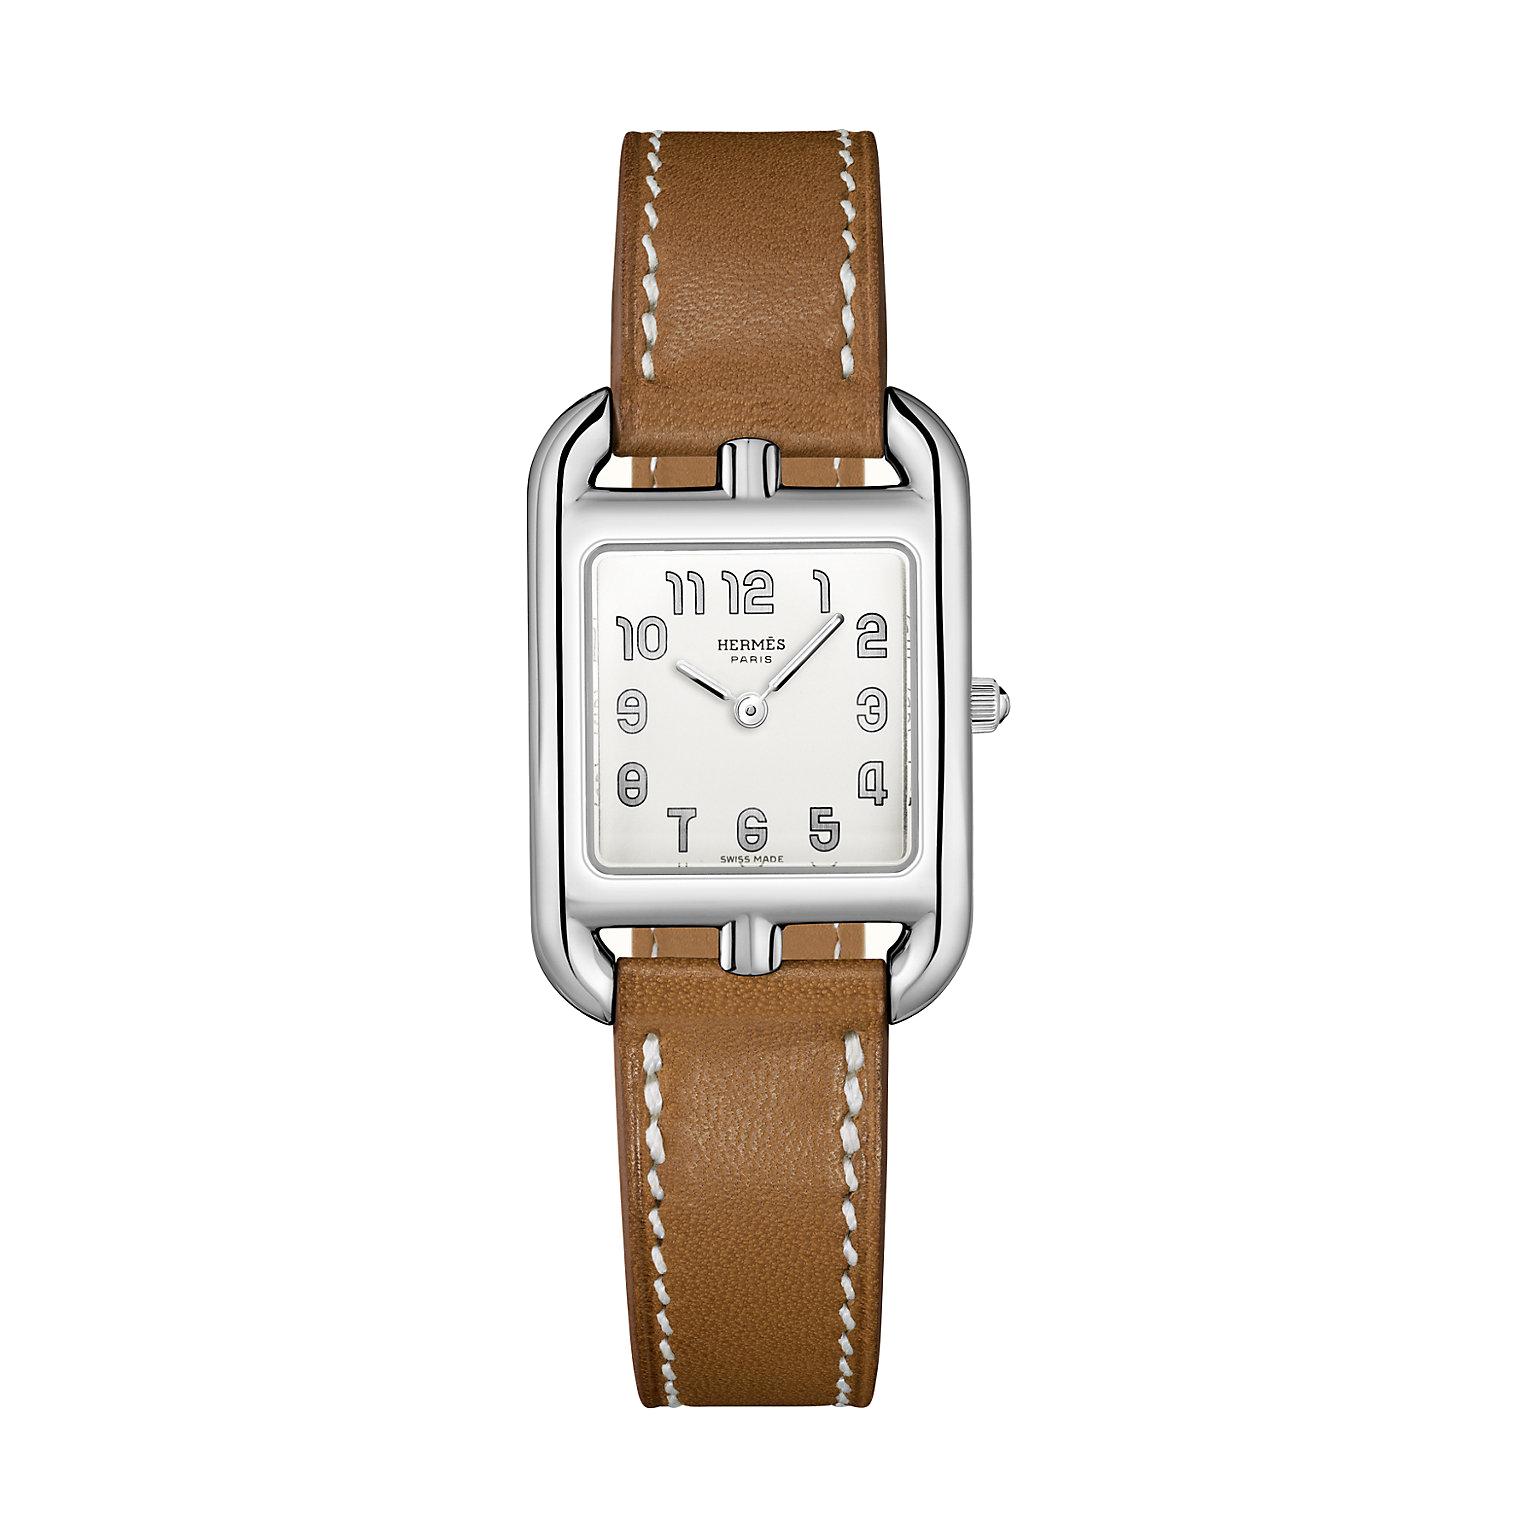 Hermès-cape-cod-23-x-23mm-Hall-of-Time-040232WW00